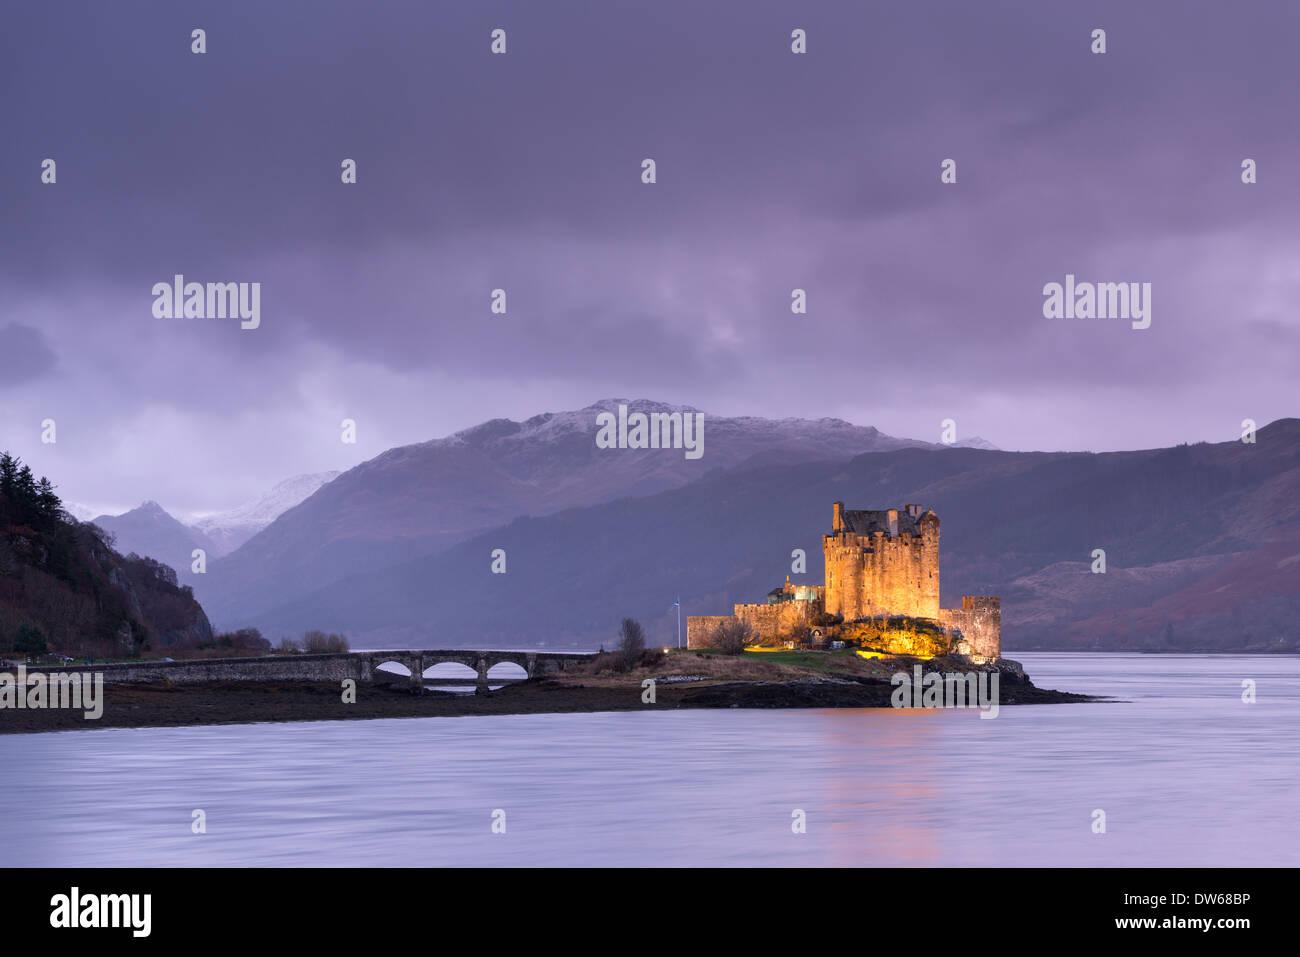 Dämmerung über Eilean Donan Castle am Loch Duich, Dornie, Schottland. Winter (Dezember) 2013. Stockbild